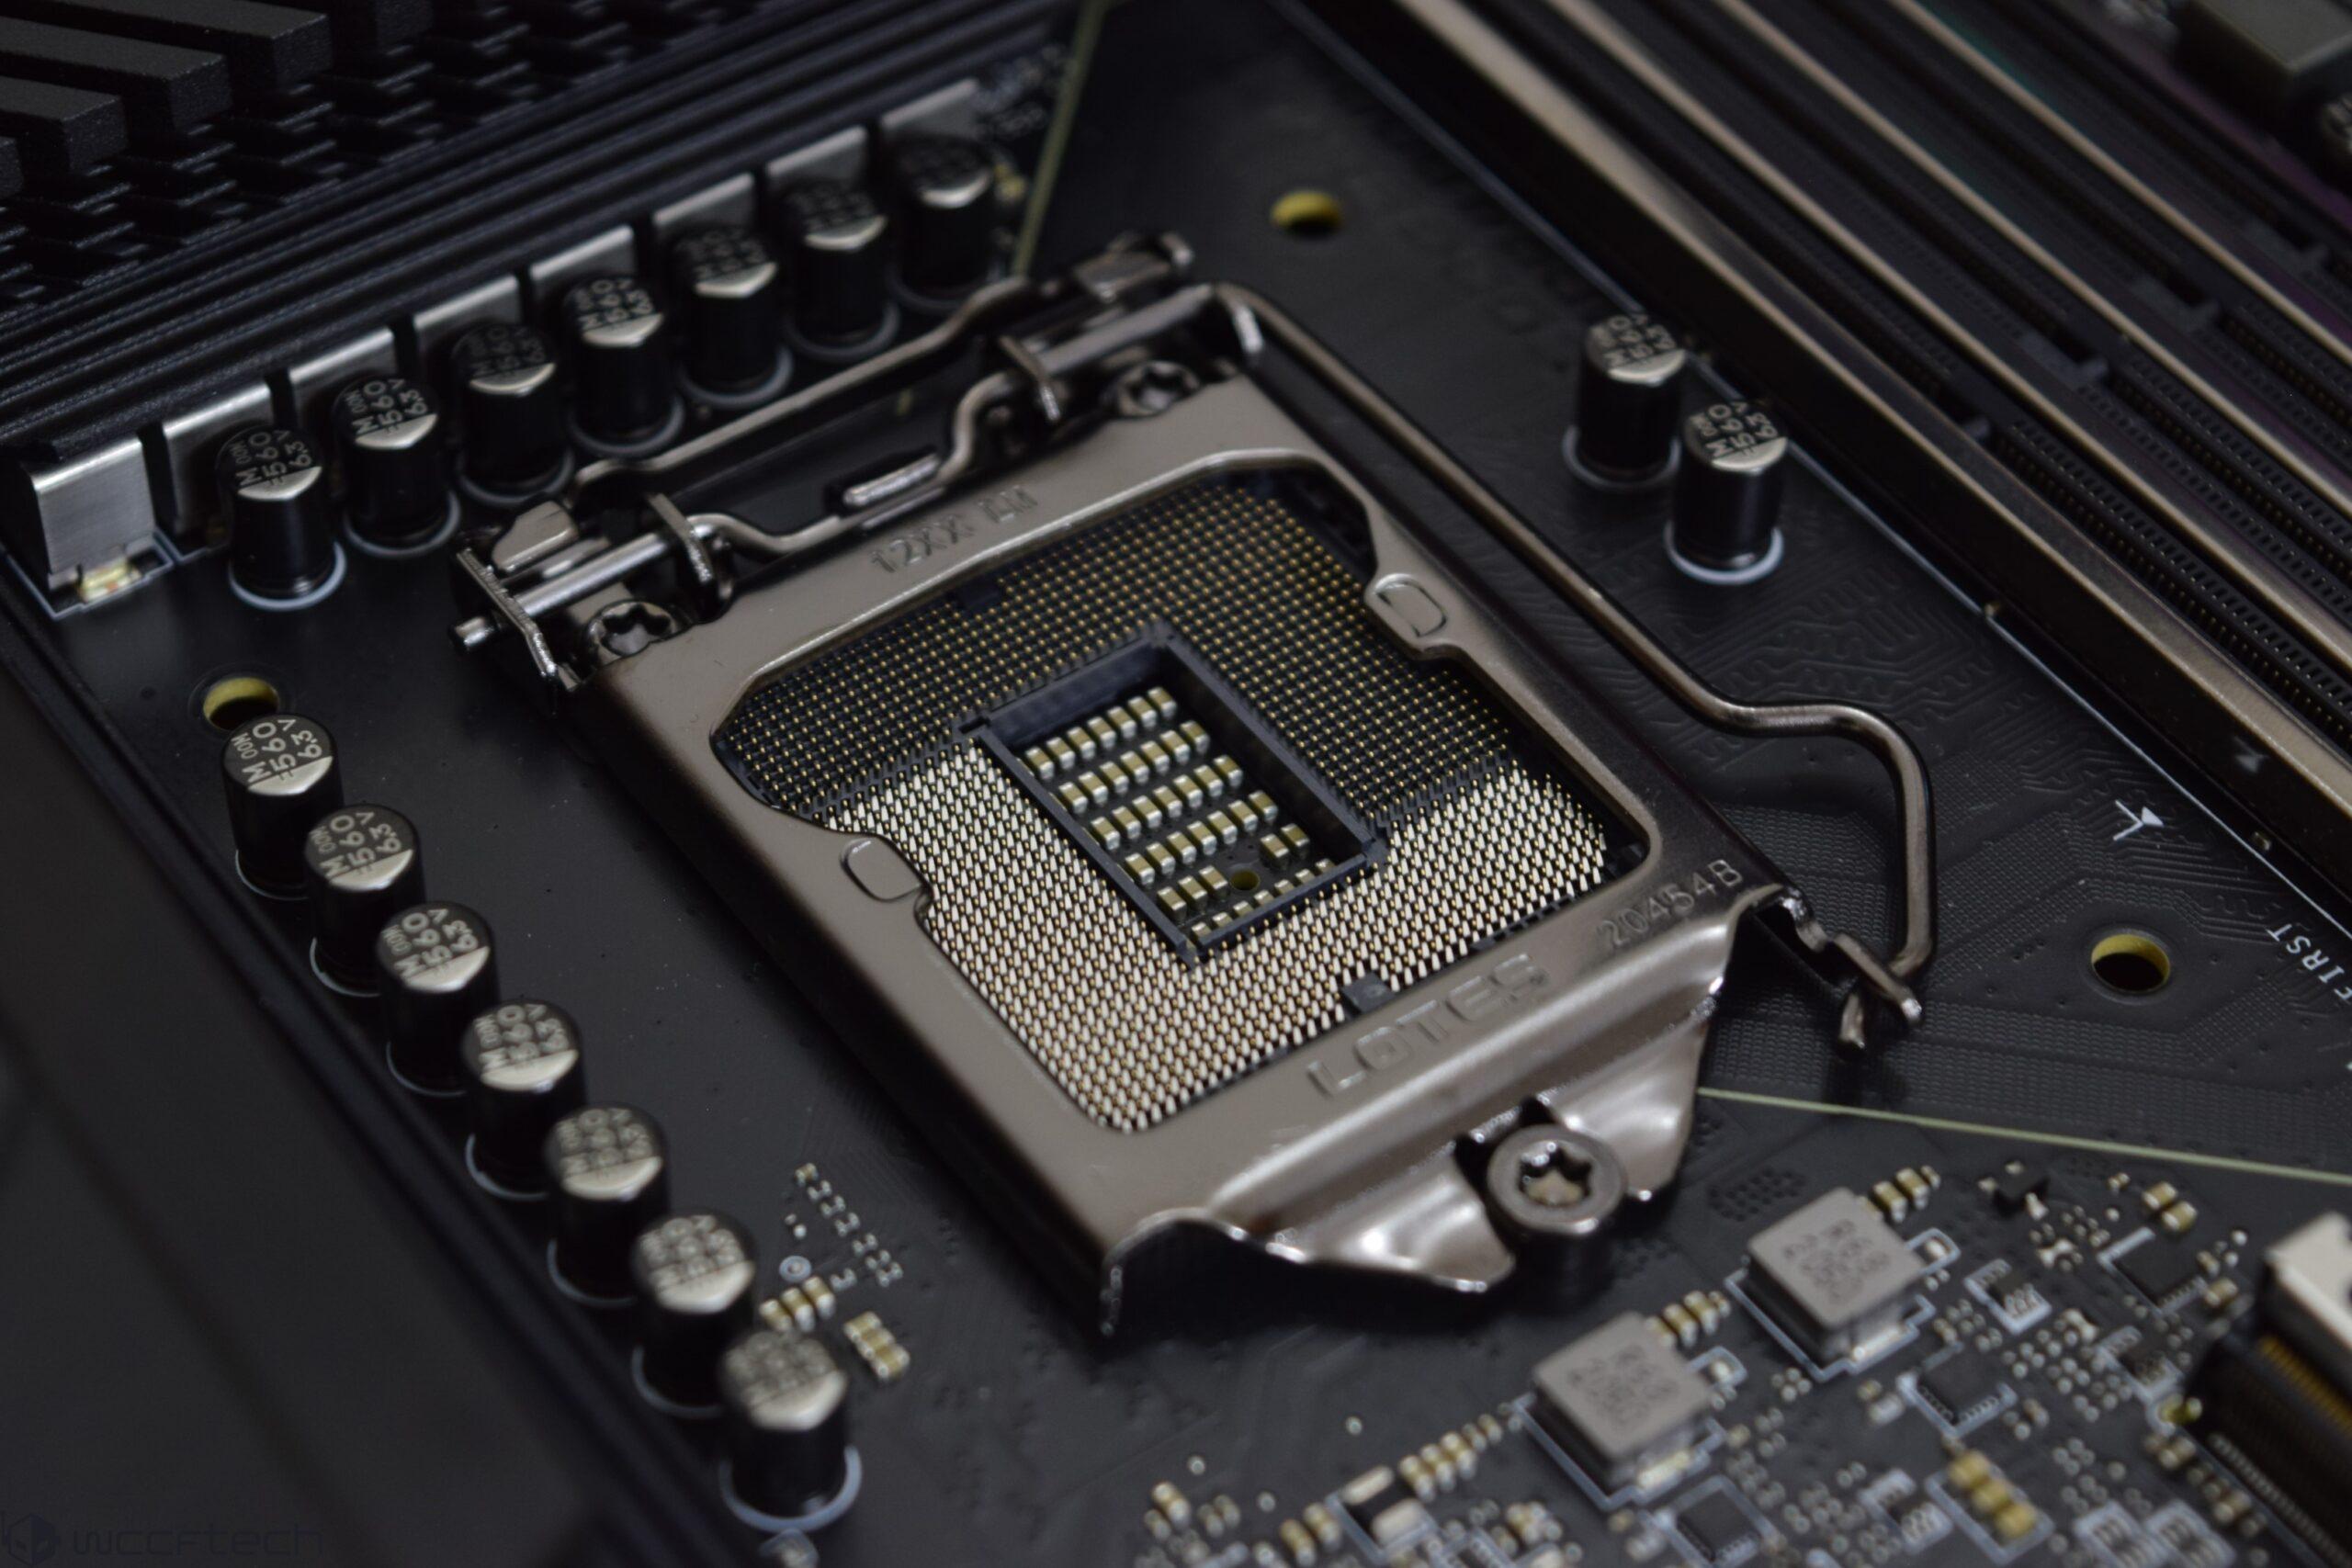 Intel Z690 'Alder Lake' Motherboards Expected in Q4 2021, Z790 'Raptor Lake' In Q3 2022, AMD AM5 'Ryzen' Motherboards In Q2 2022